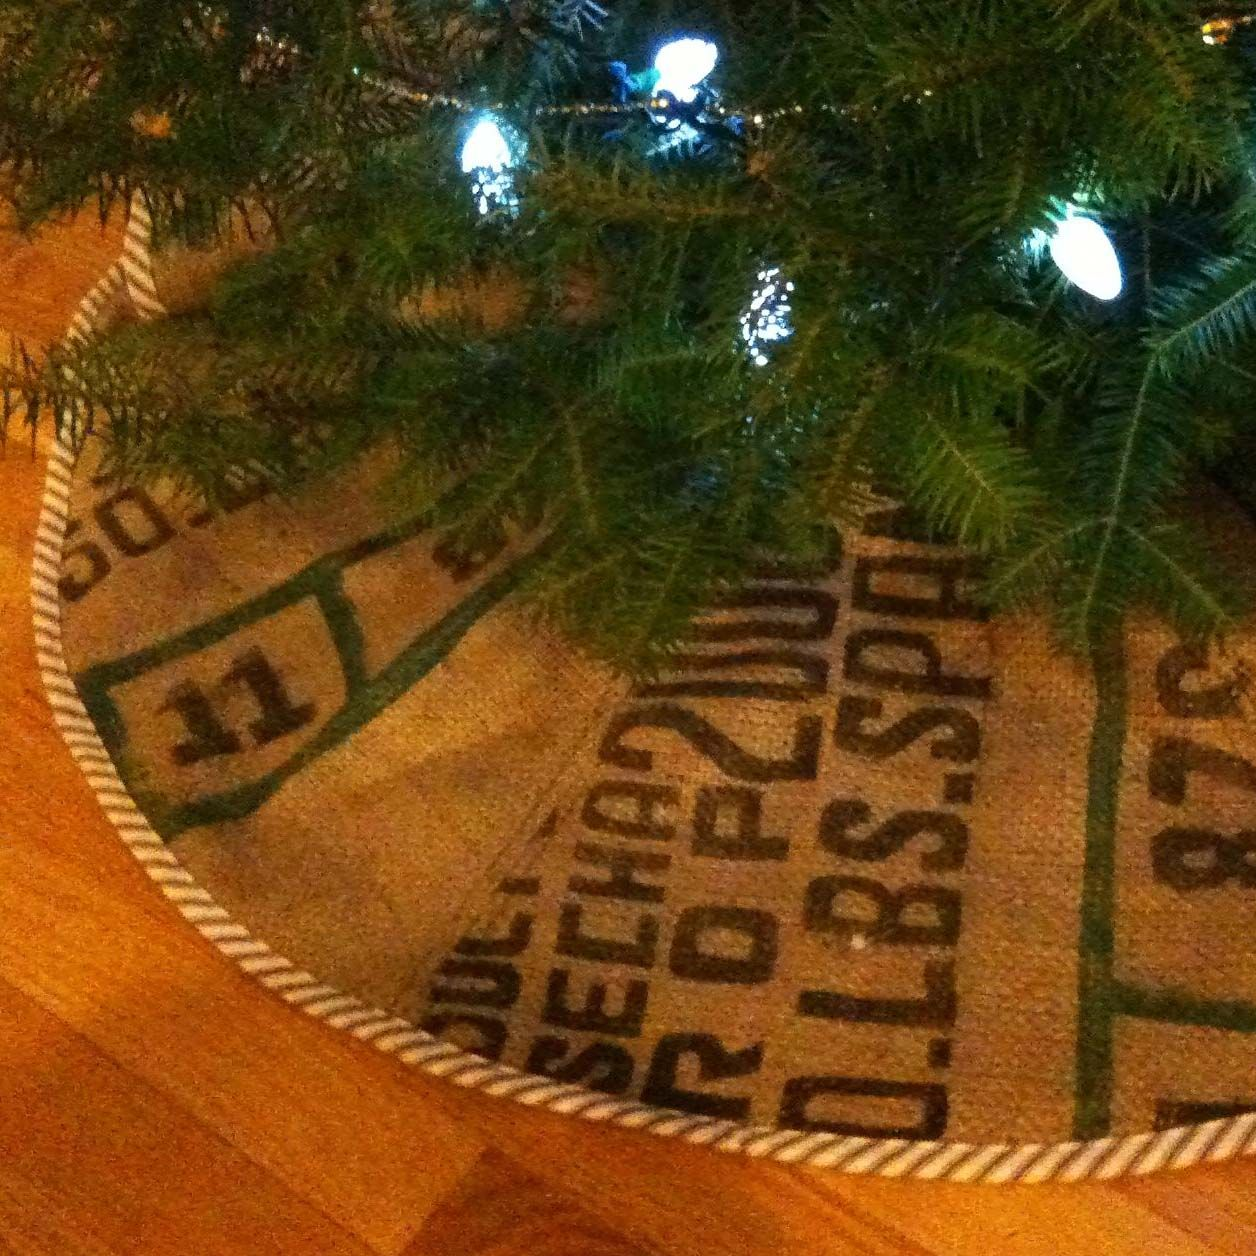 Coffee sack tree skirt